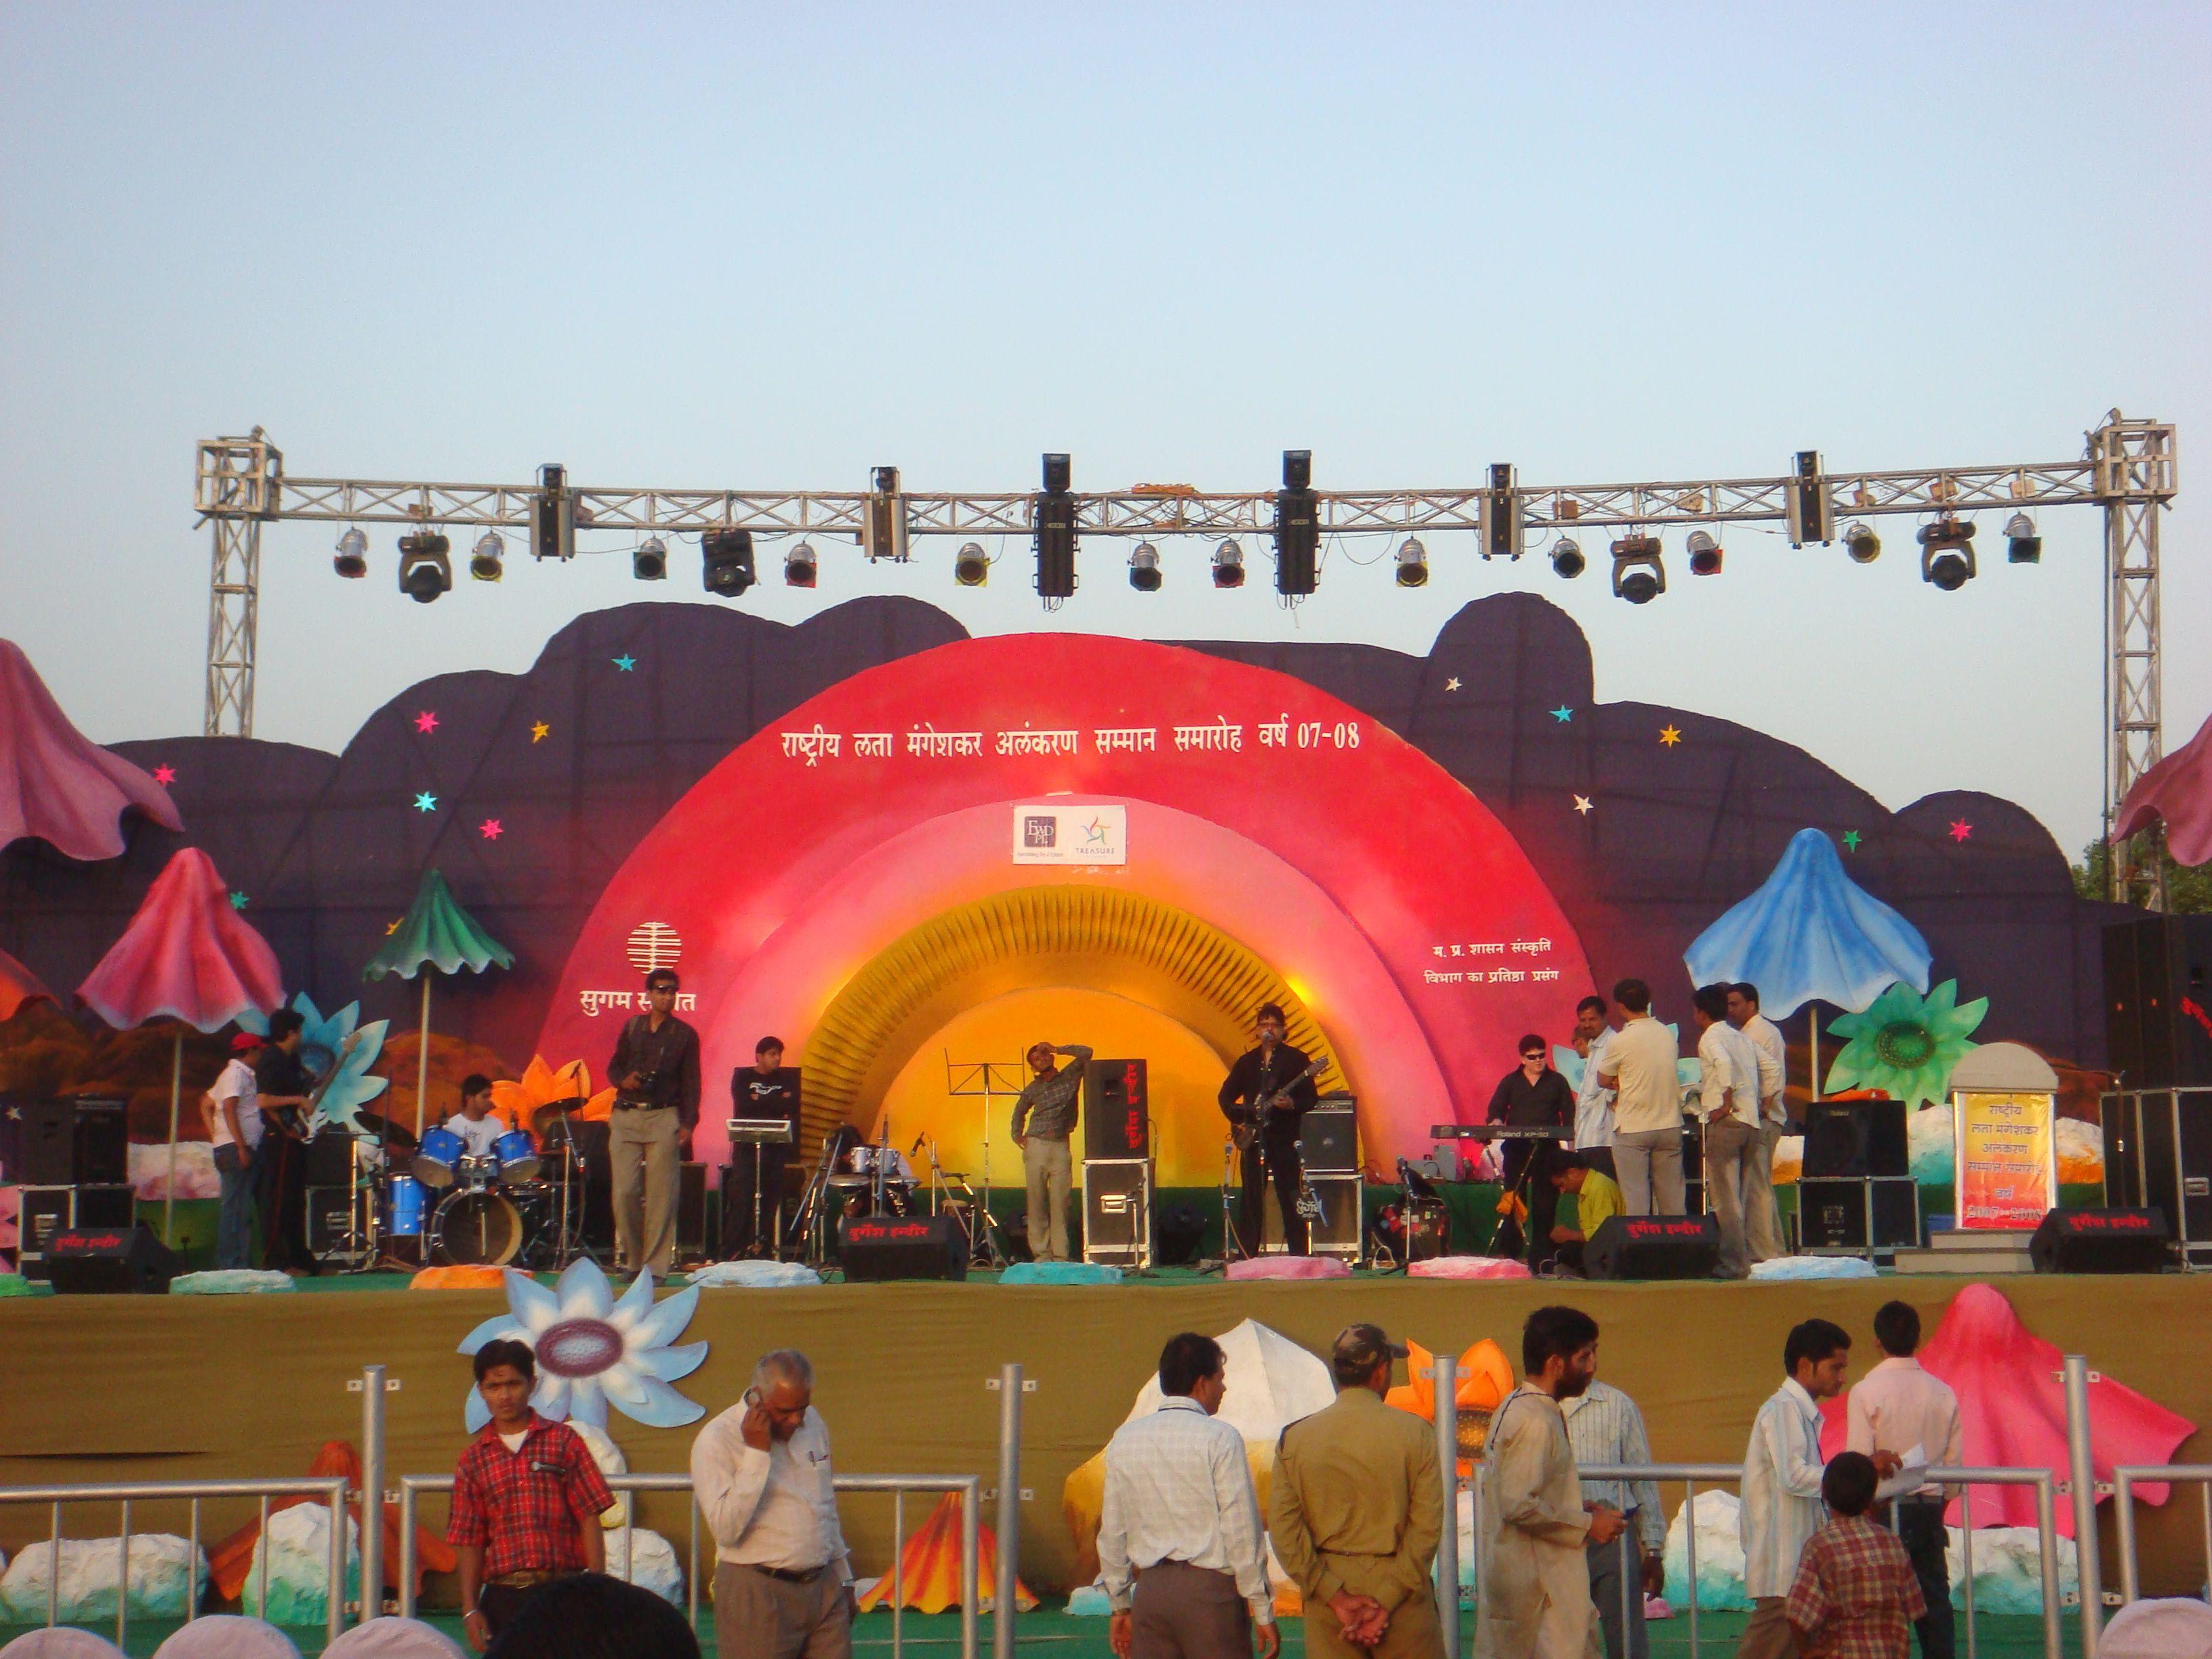 Musiclata mangeshkarnightingalelata ji bollywood celebrities bollywood celebrity performing the stage of durgesh sound light system indore nvjuhfo Choice Image